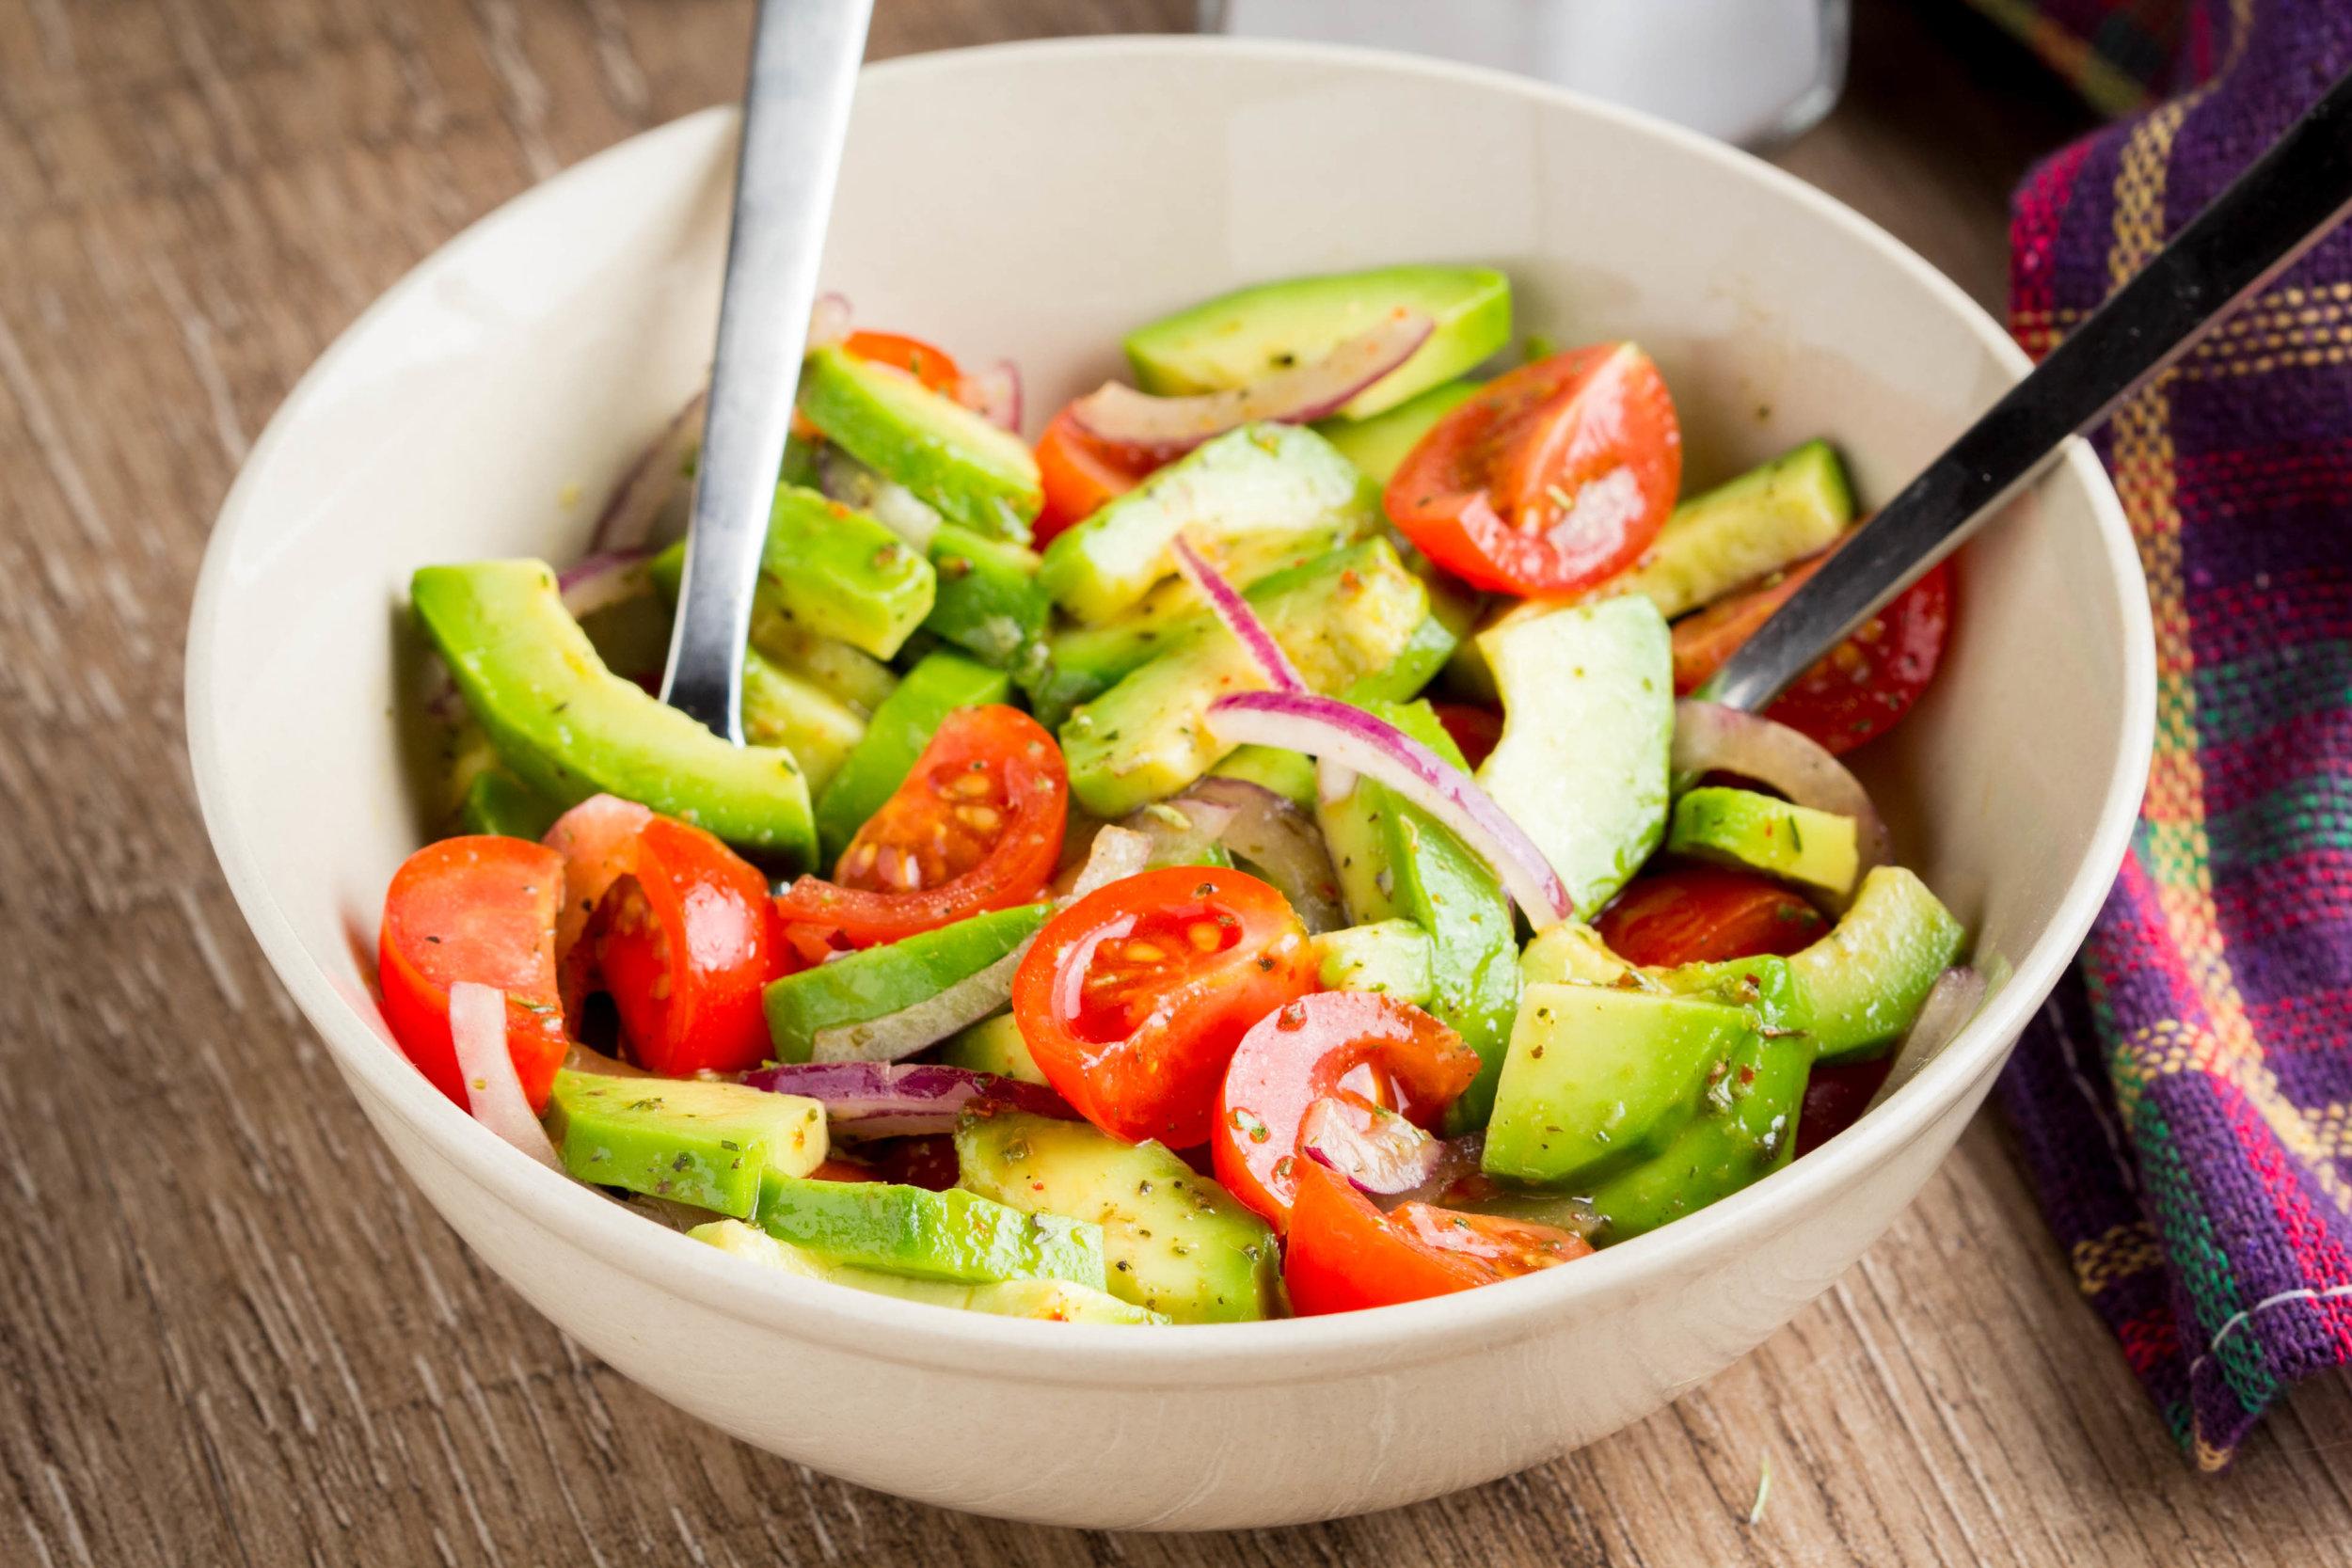 Avocado and tomato salad.jpg